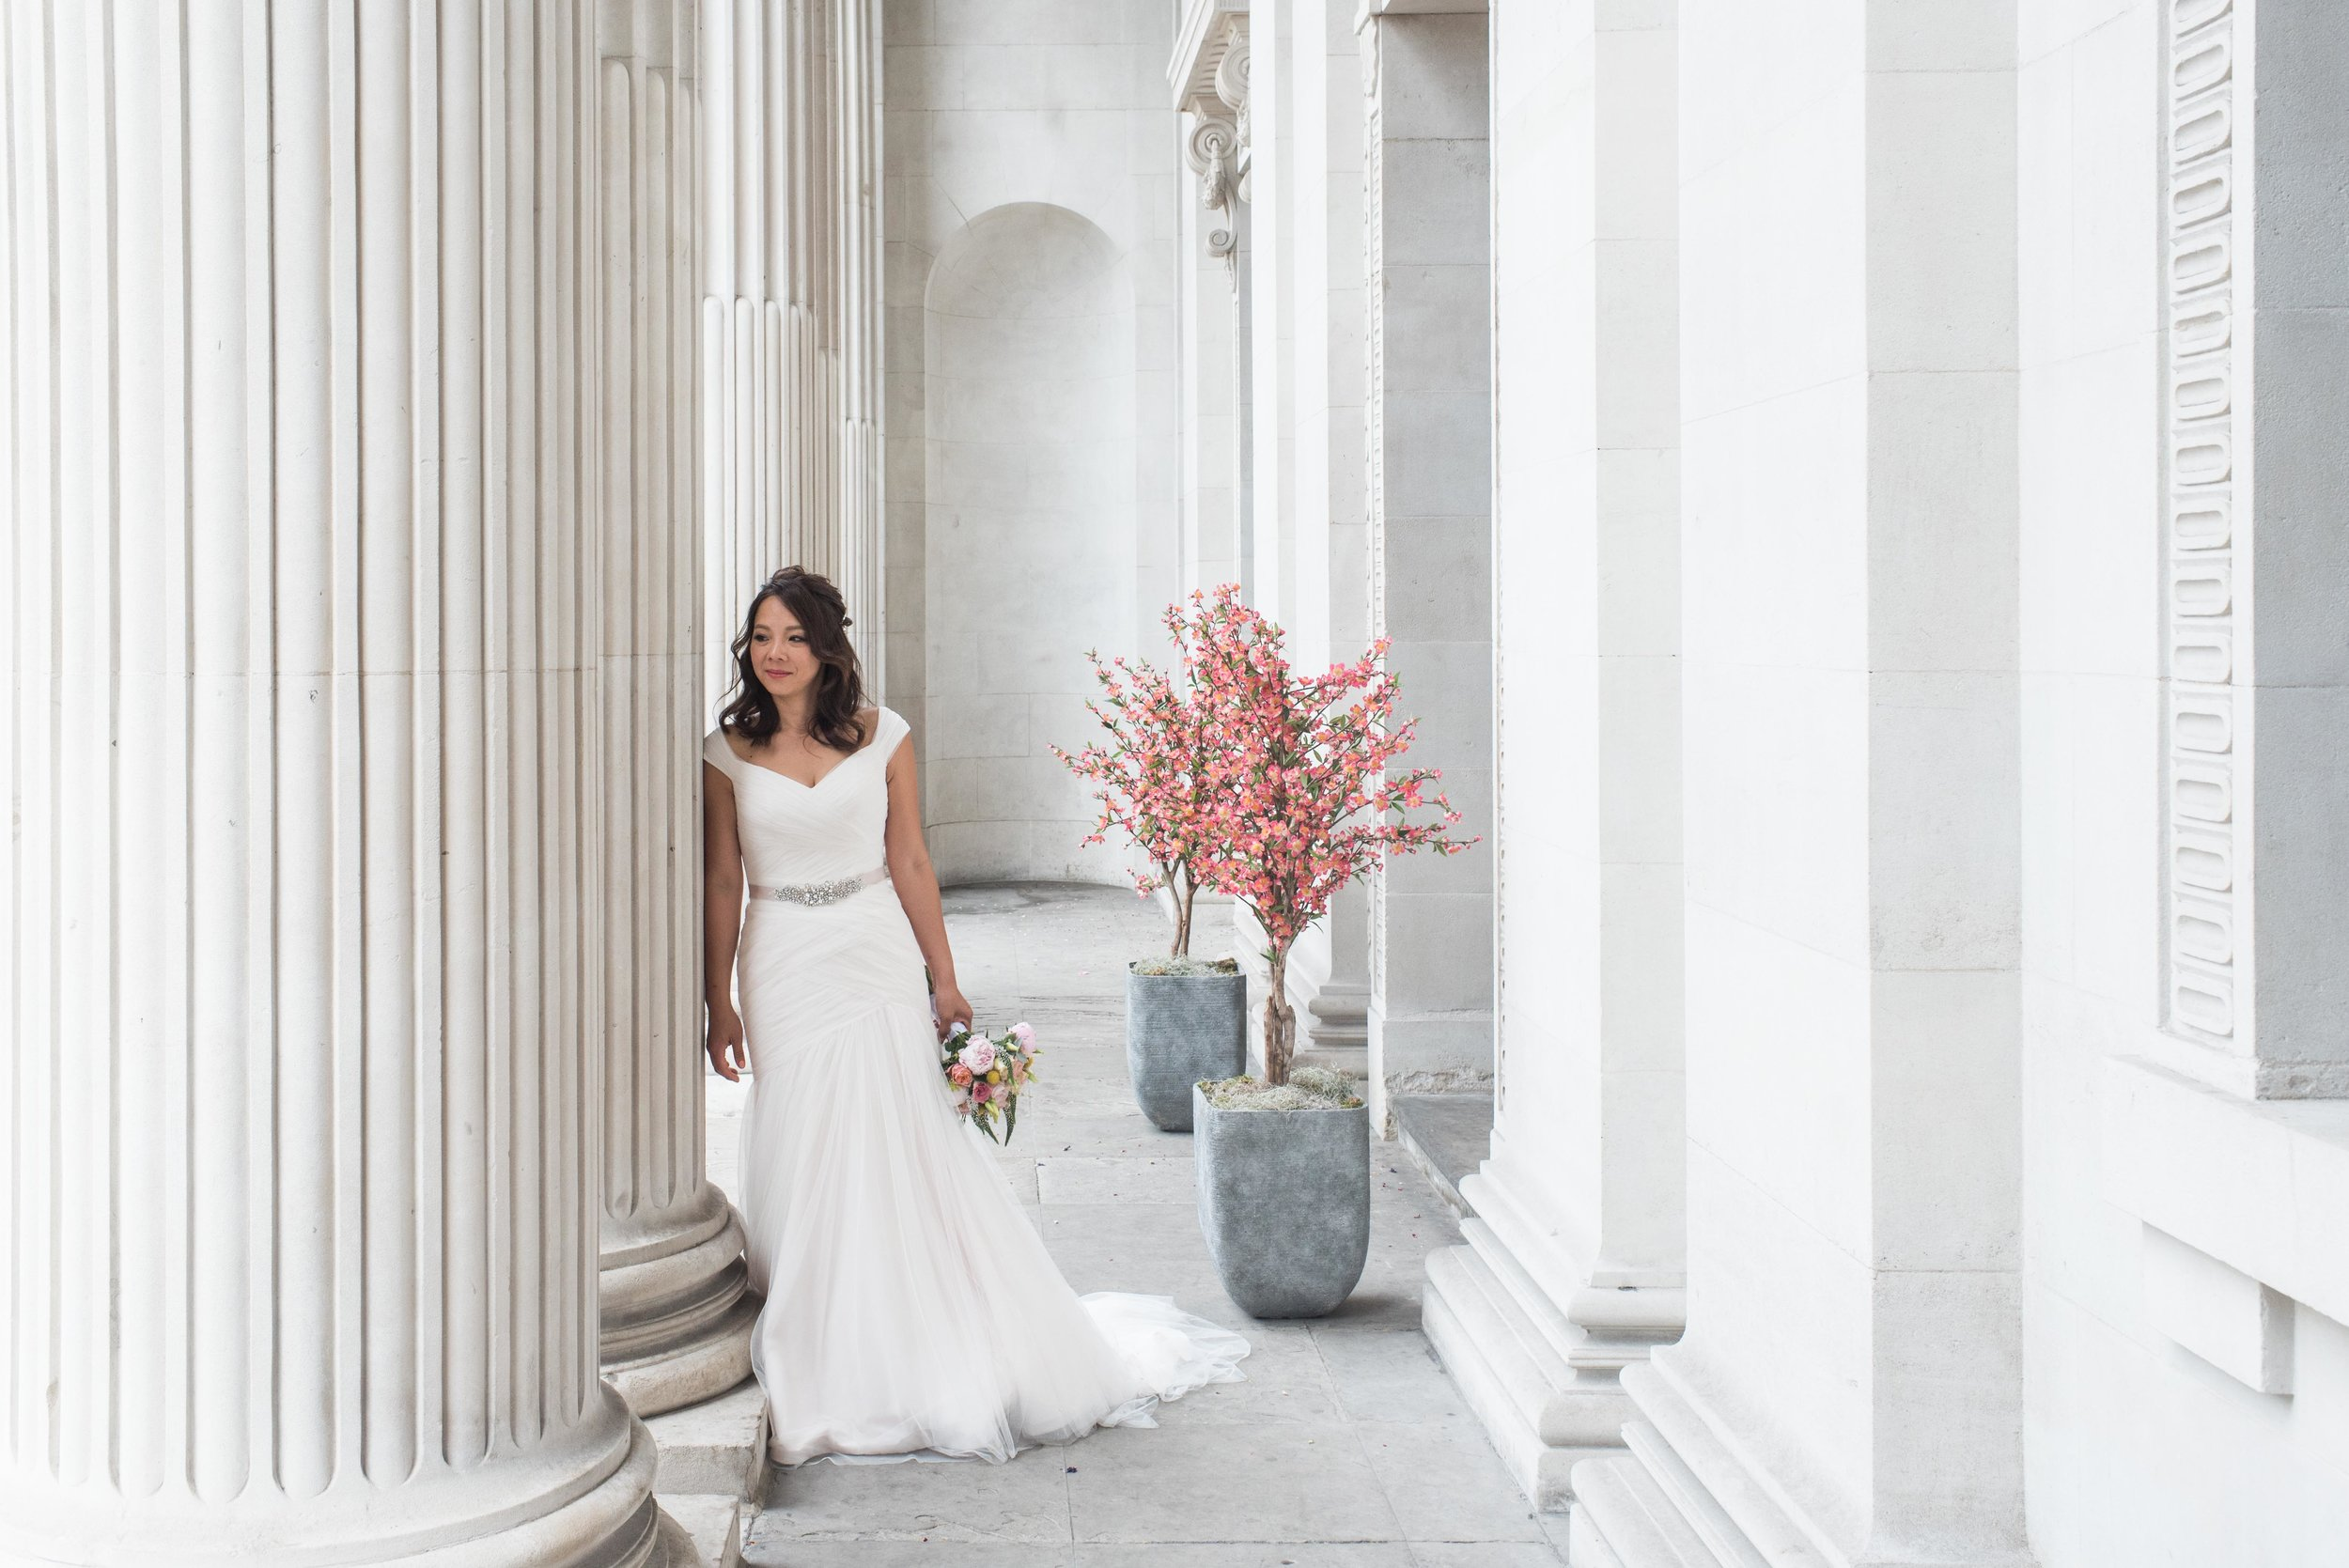 D&M_Marylebone Town Hall Wedding (54 of 239).jpg